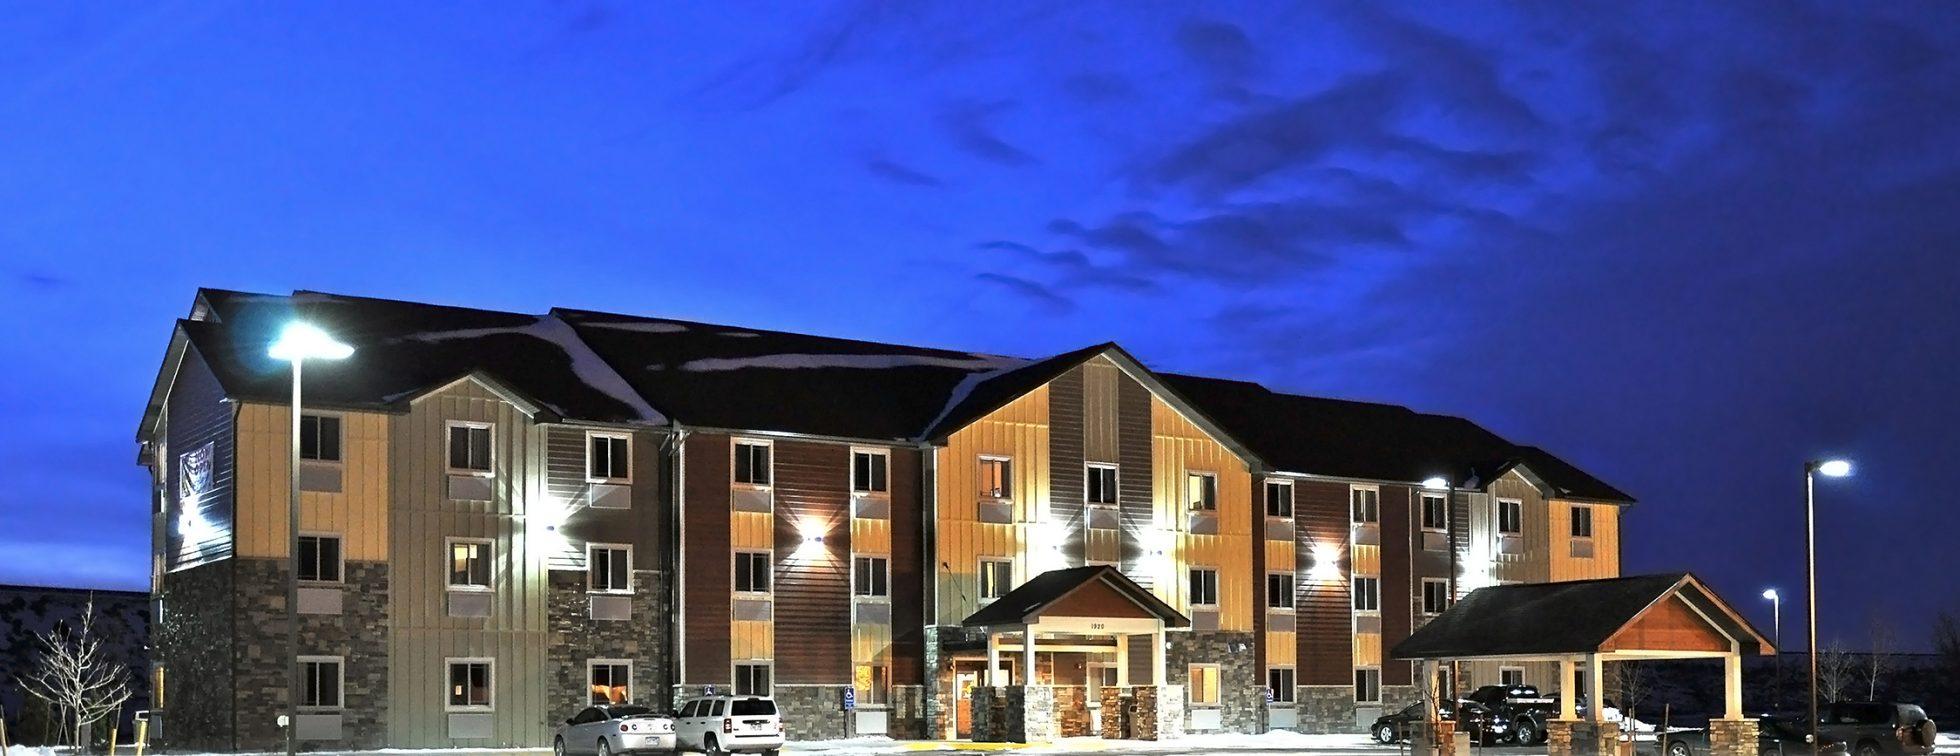 Cheyenne Wyoming Hotel My Place Hotels